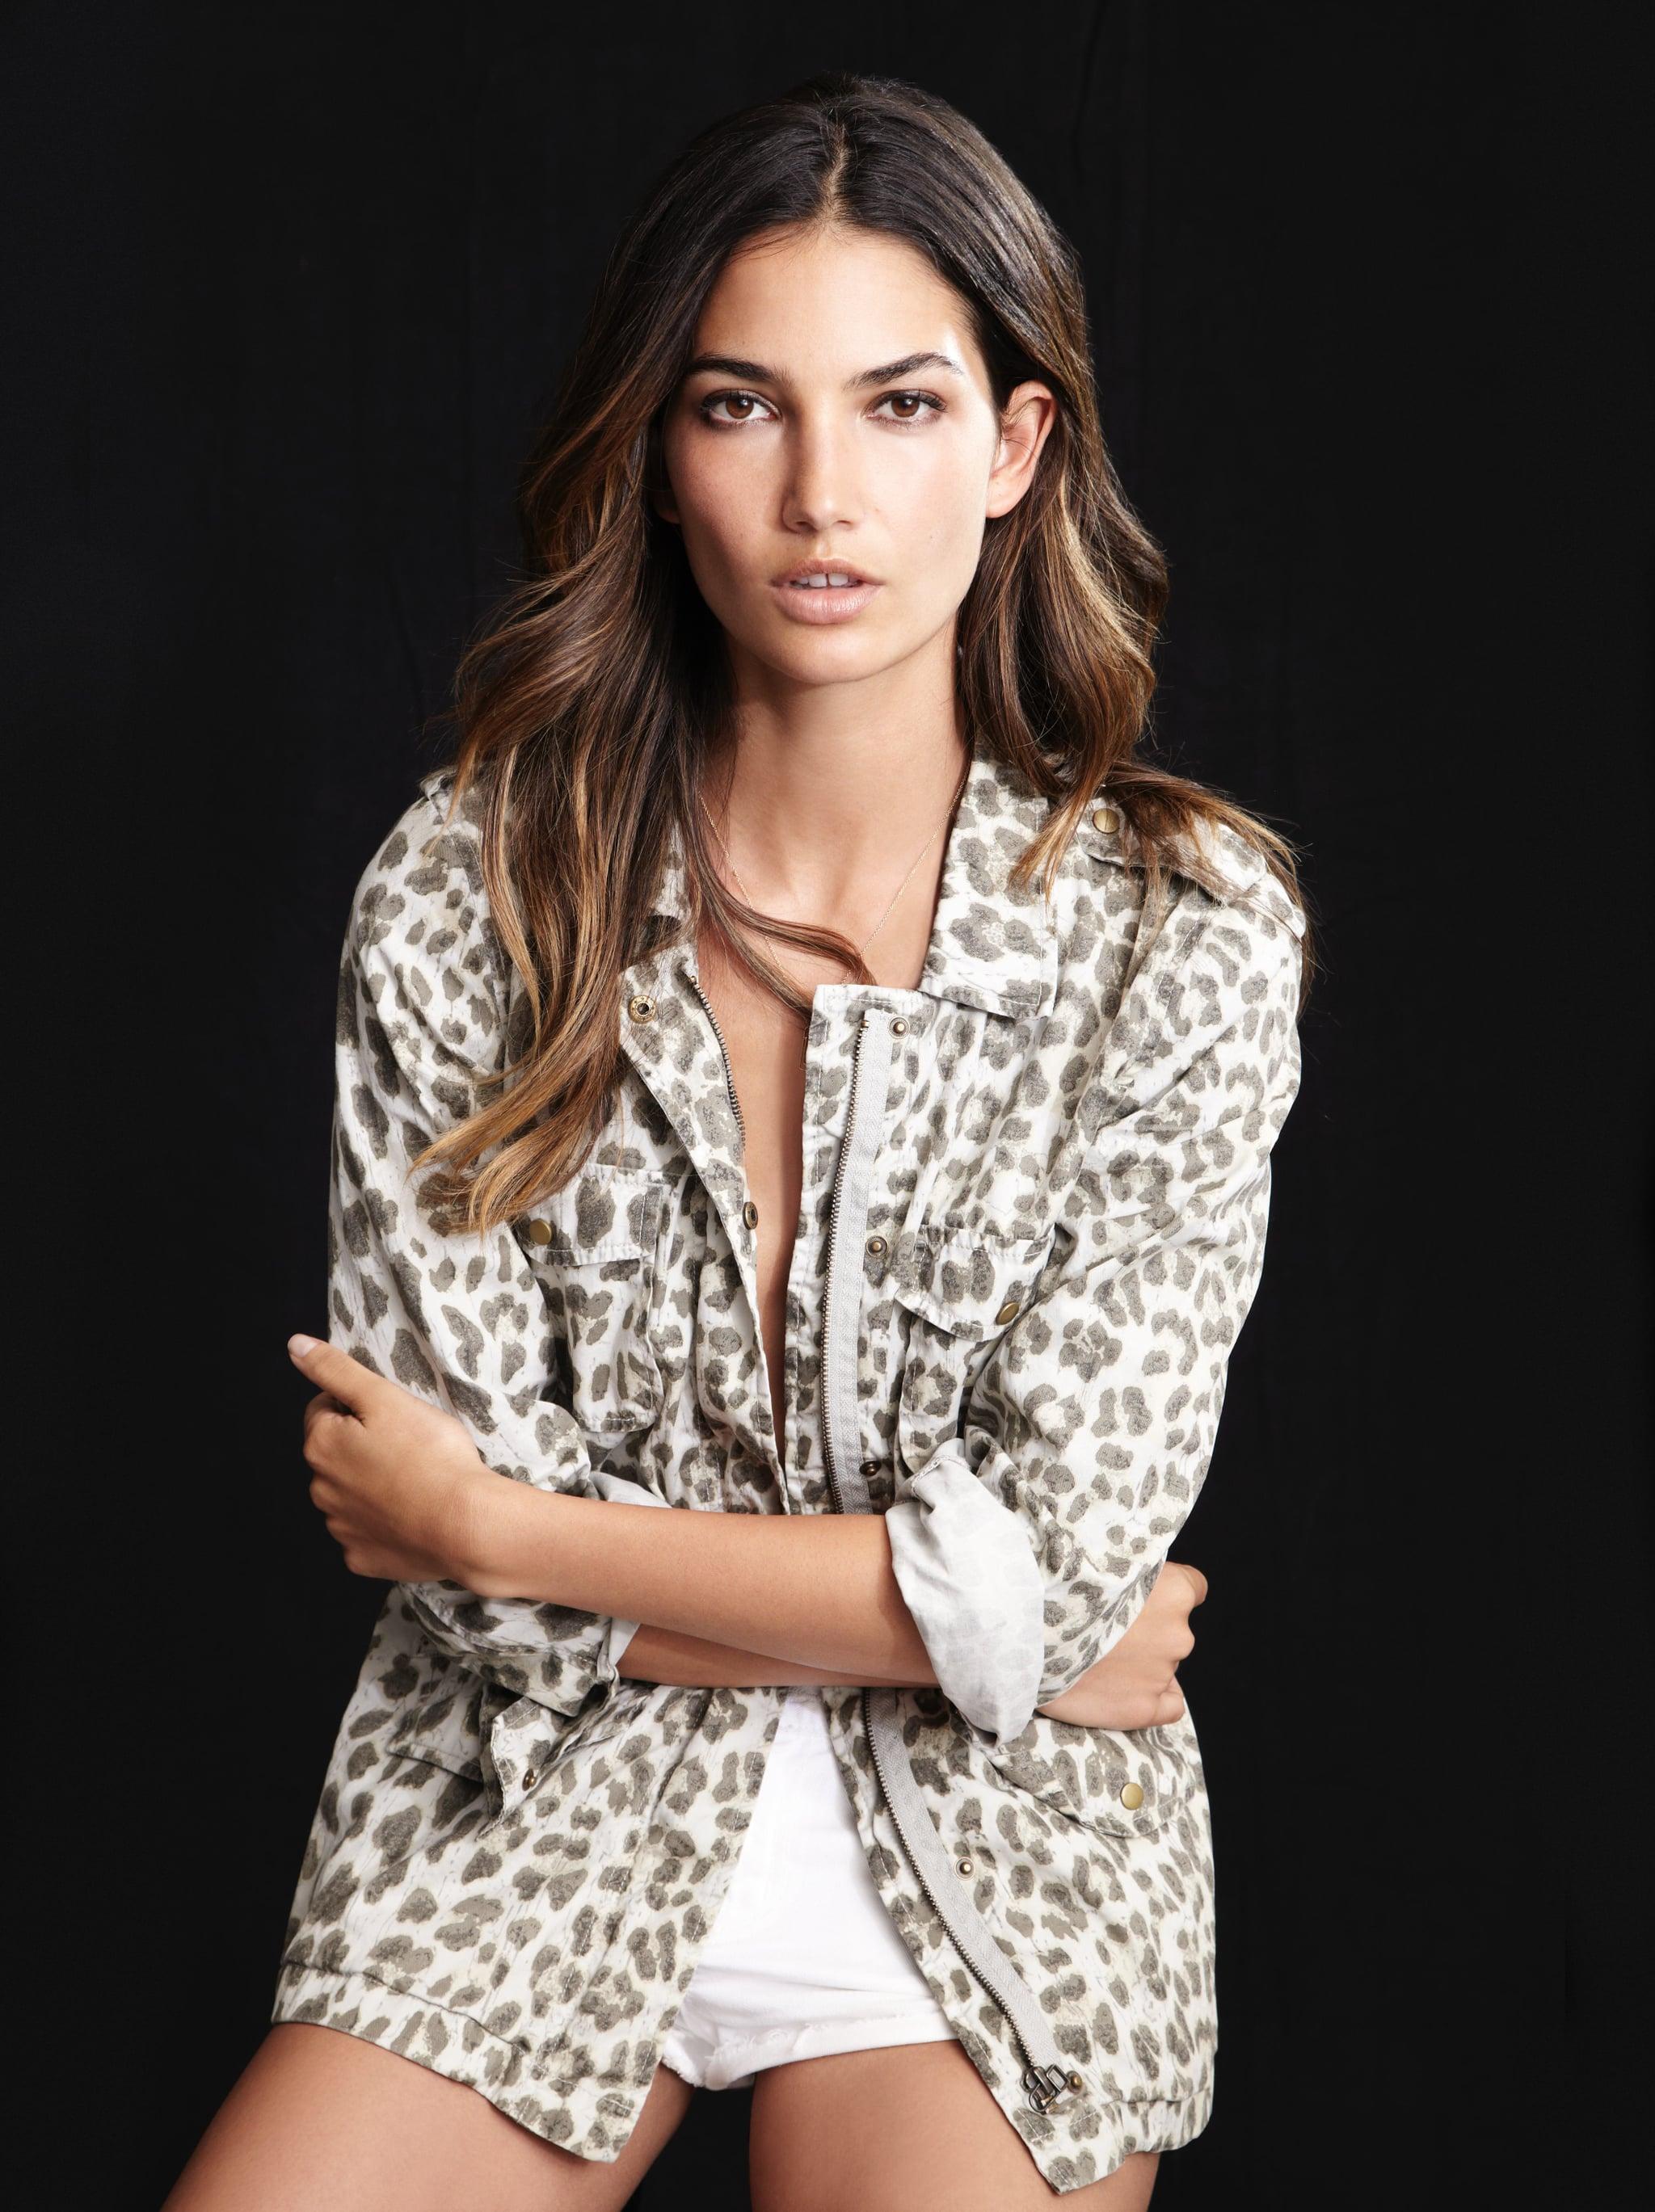 b27eeb031927d6 Lily Aldridge For Velvet Aziya Leopard Army Jacket ($158) Source: Courtesy  of Velvet